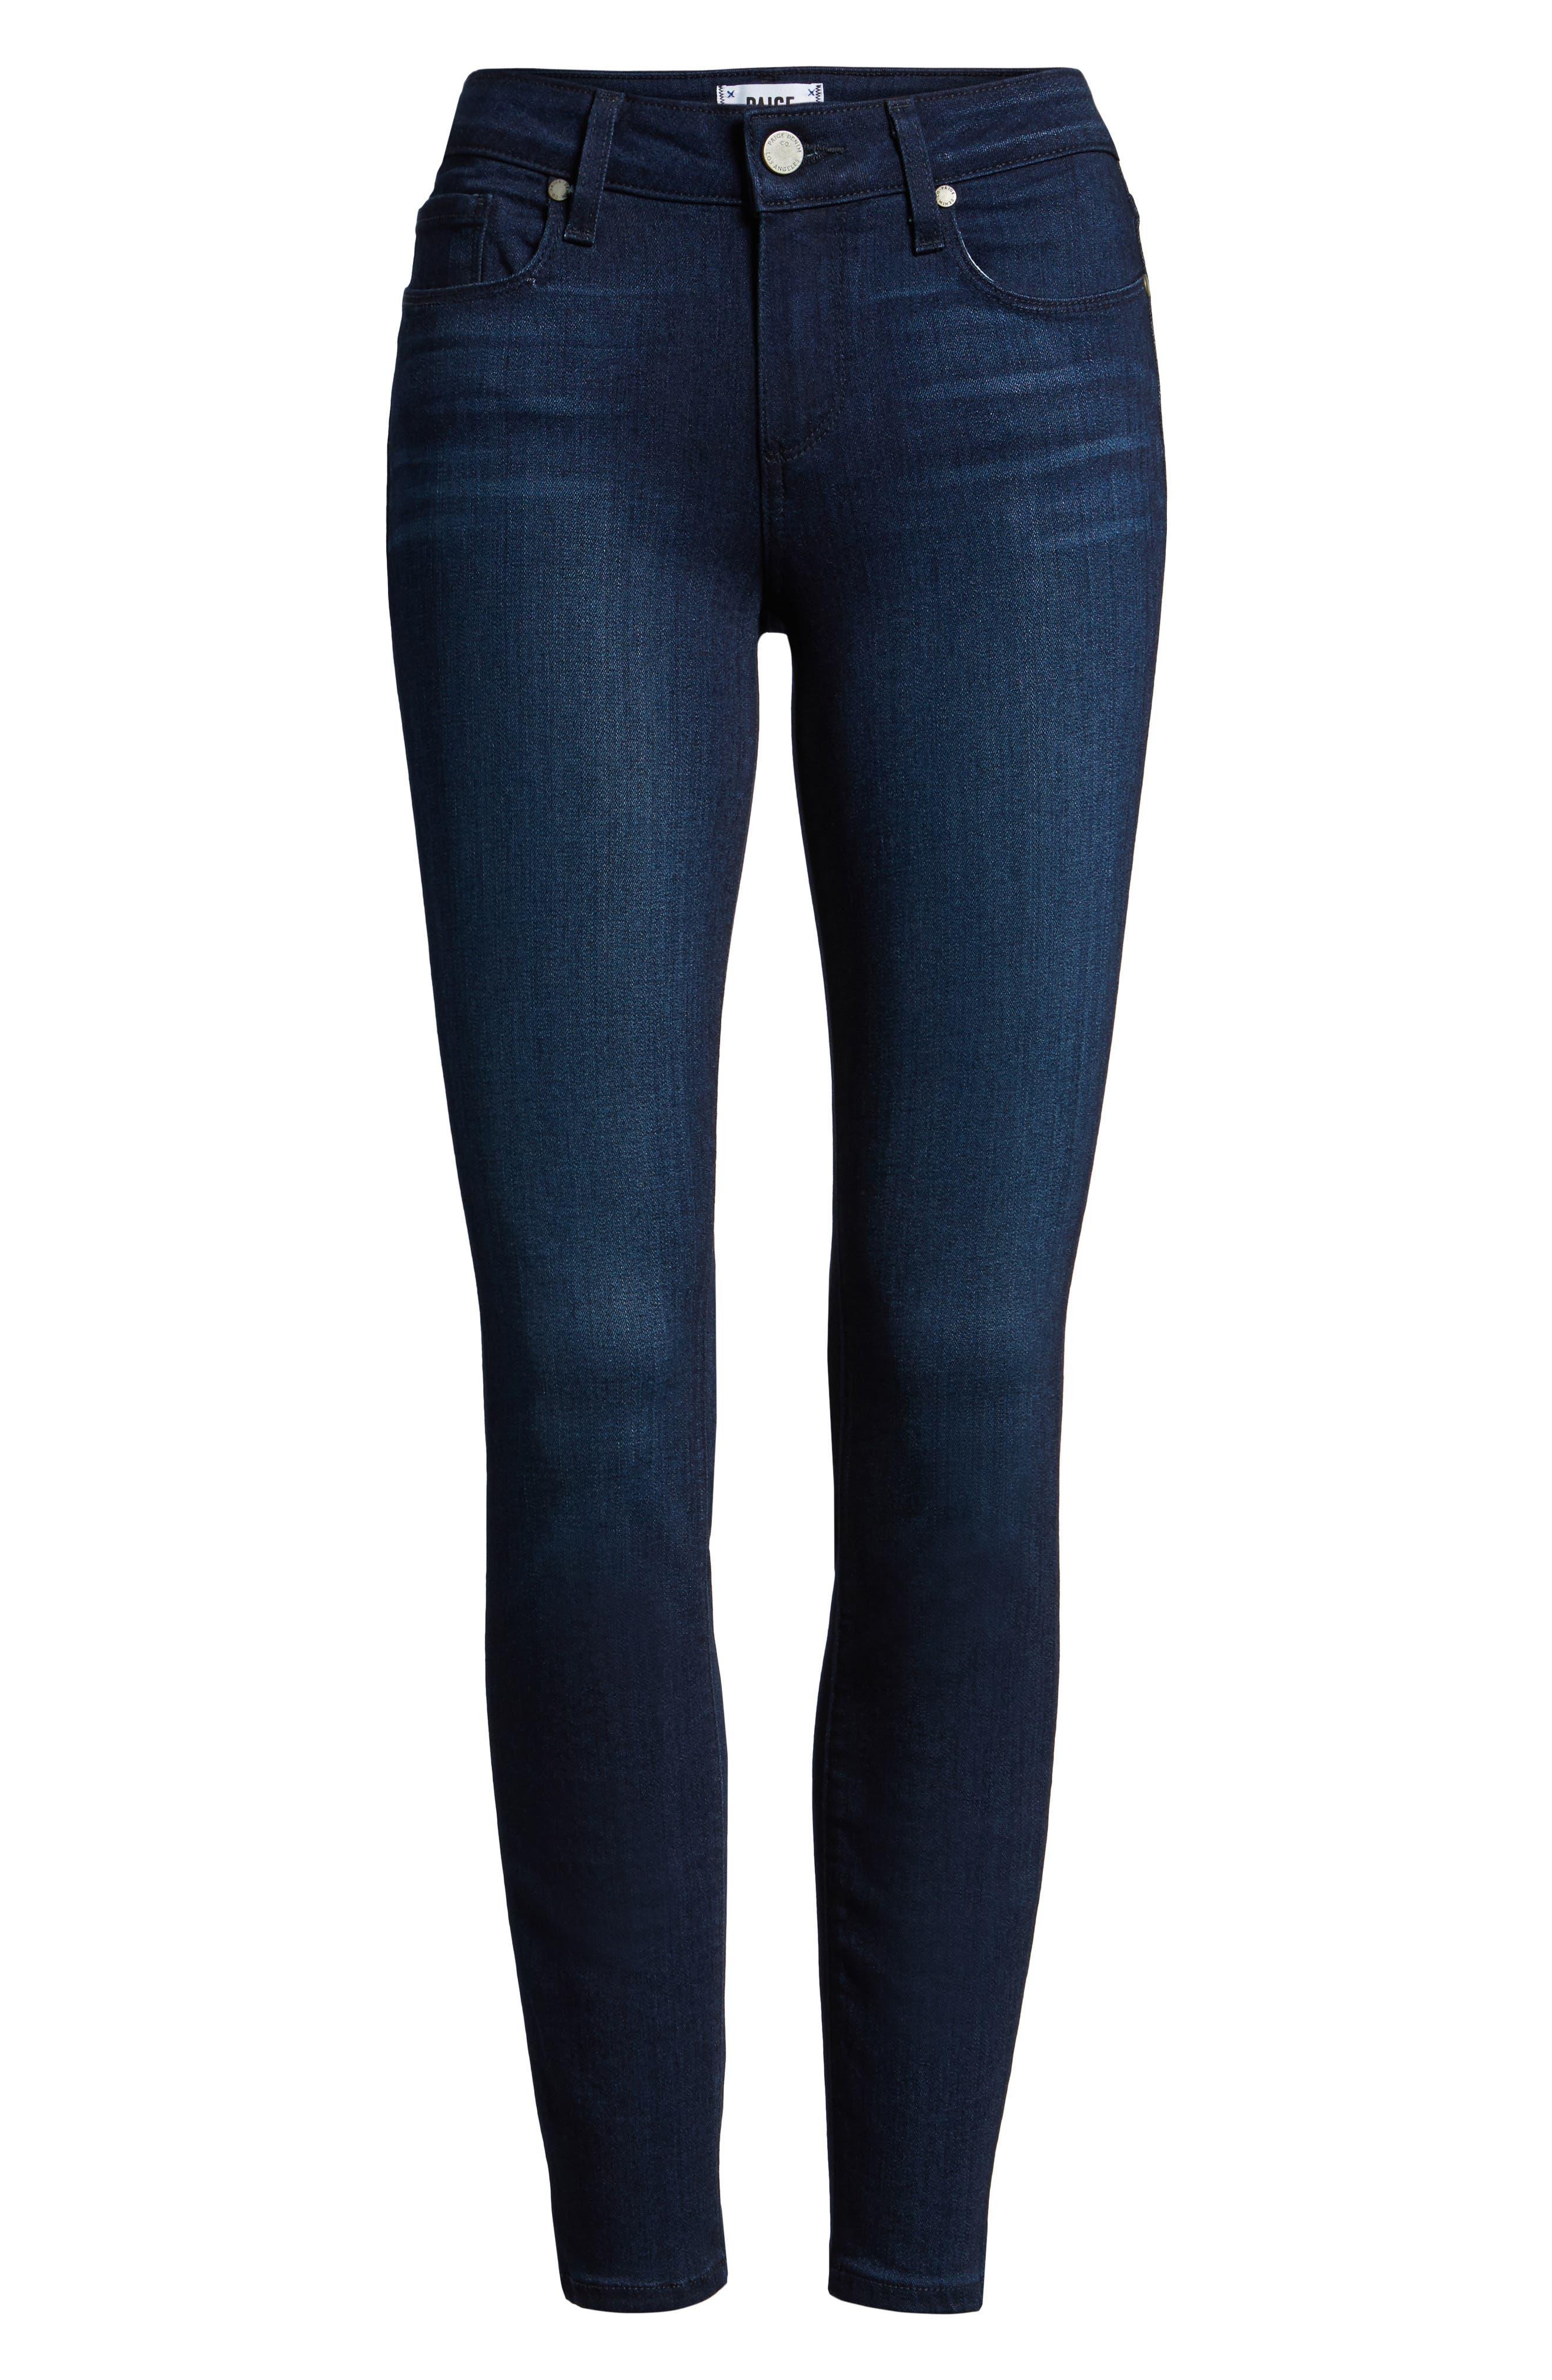 Verdugo Ankle Skinny Jeans,                             Alternate thumbnail 6, color,                             400